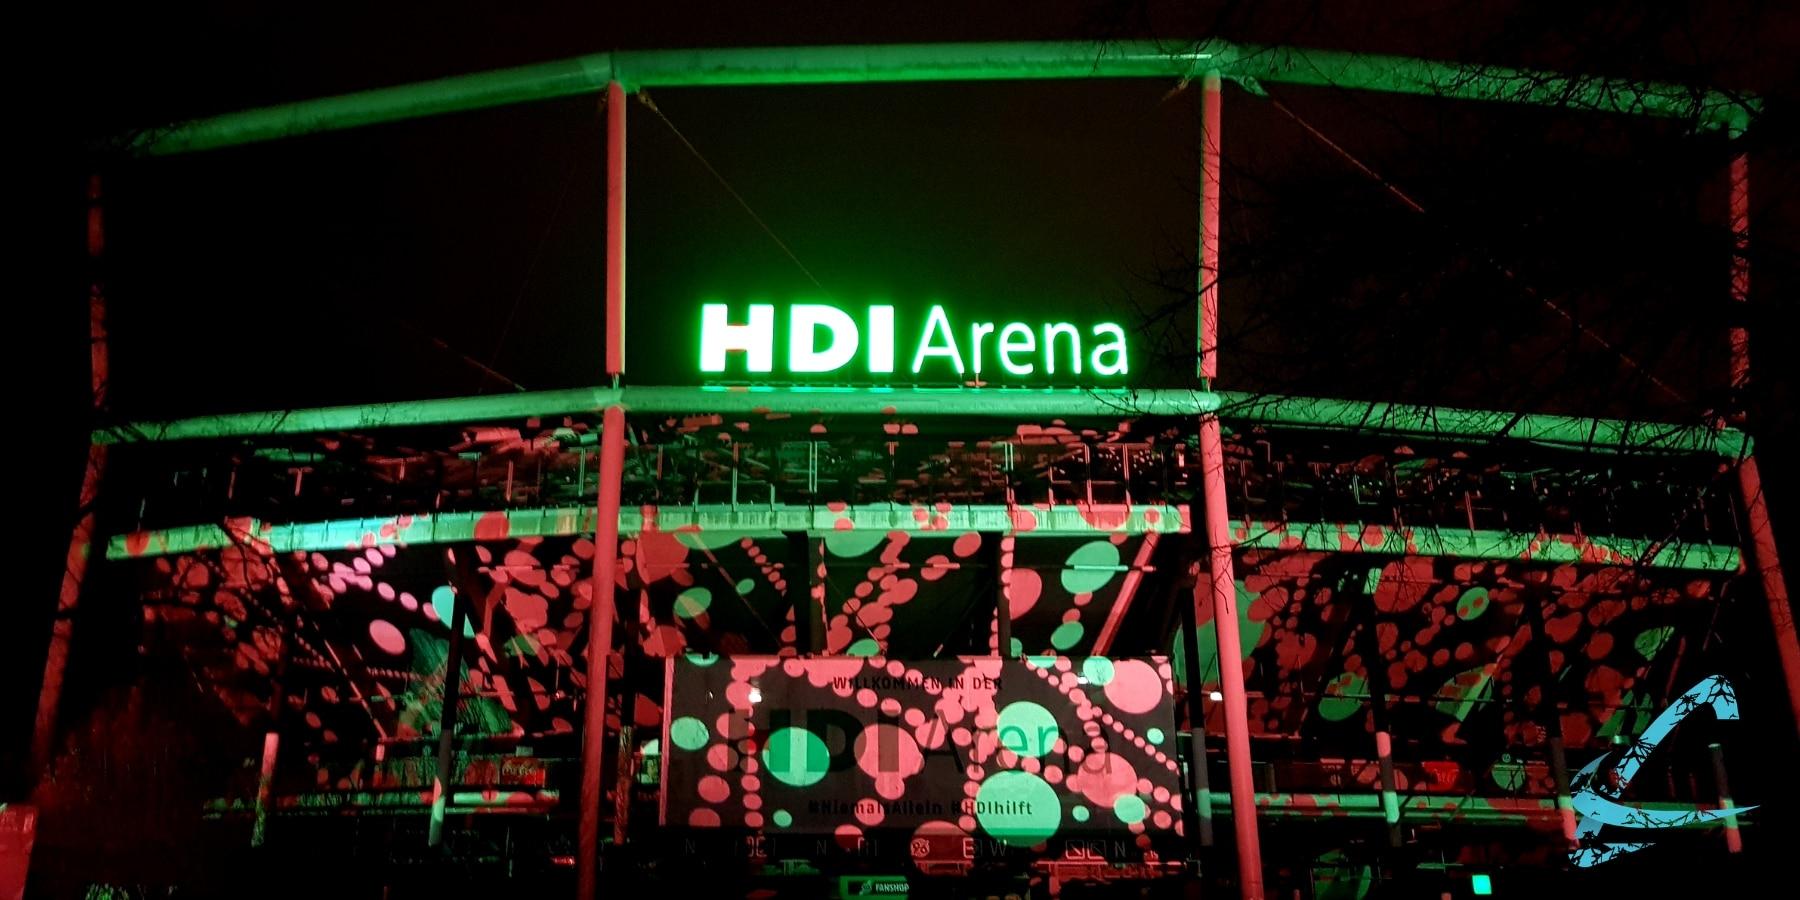 projektion-hd-arena